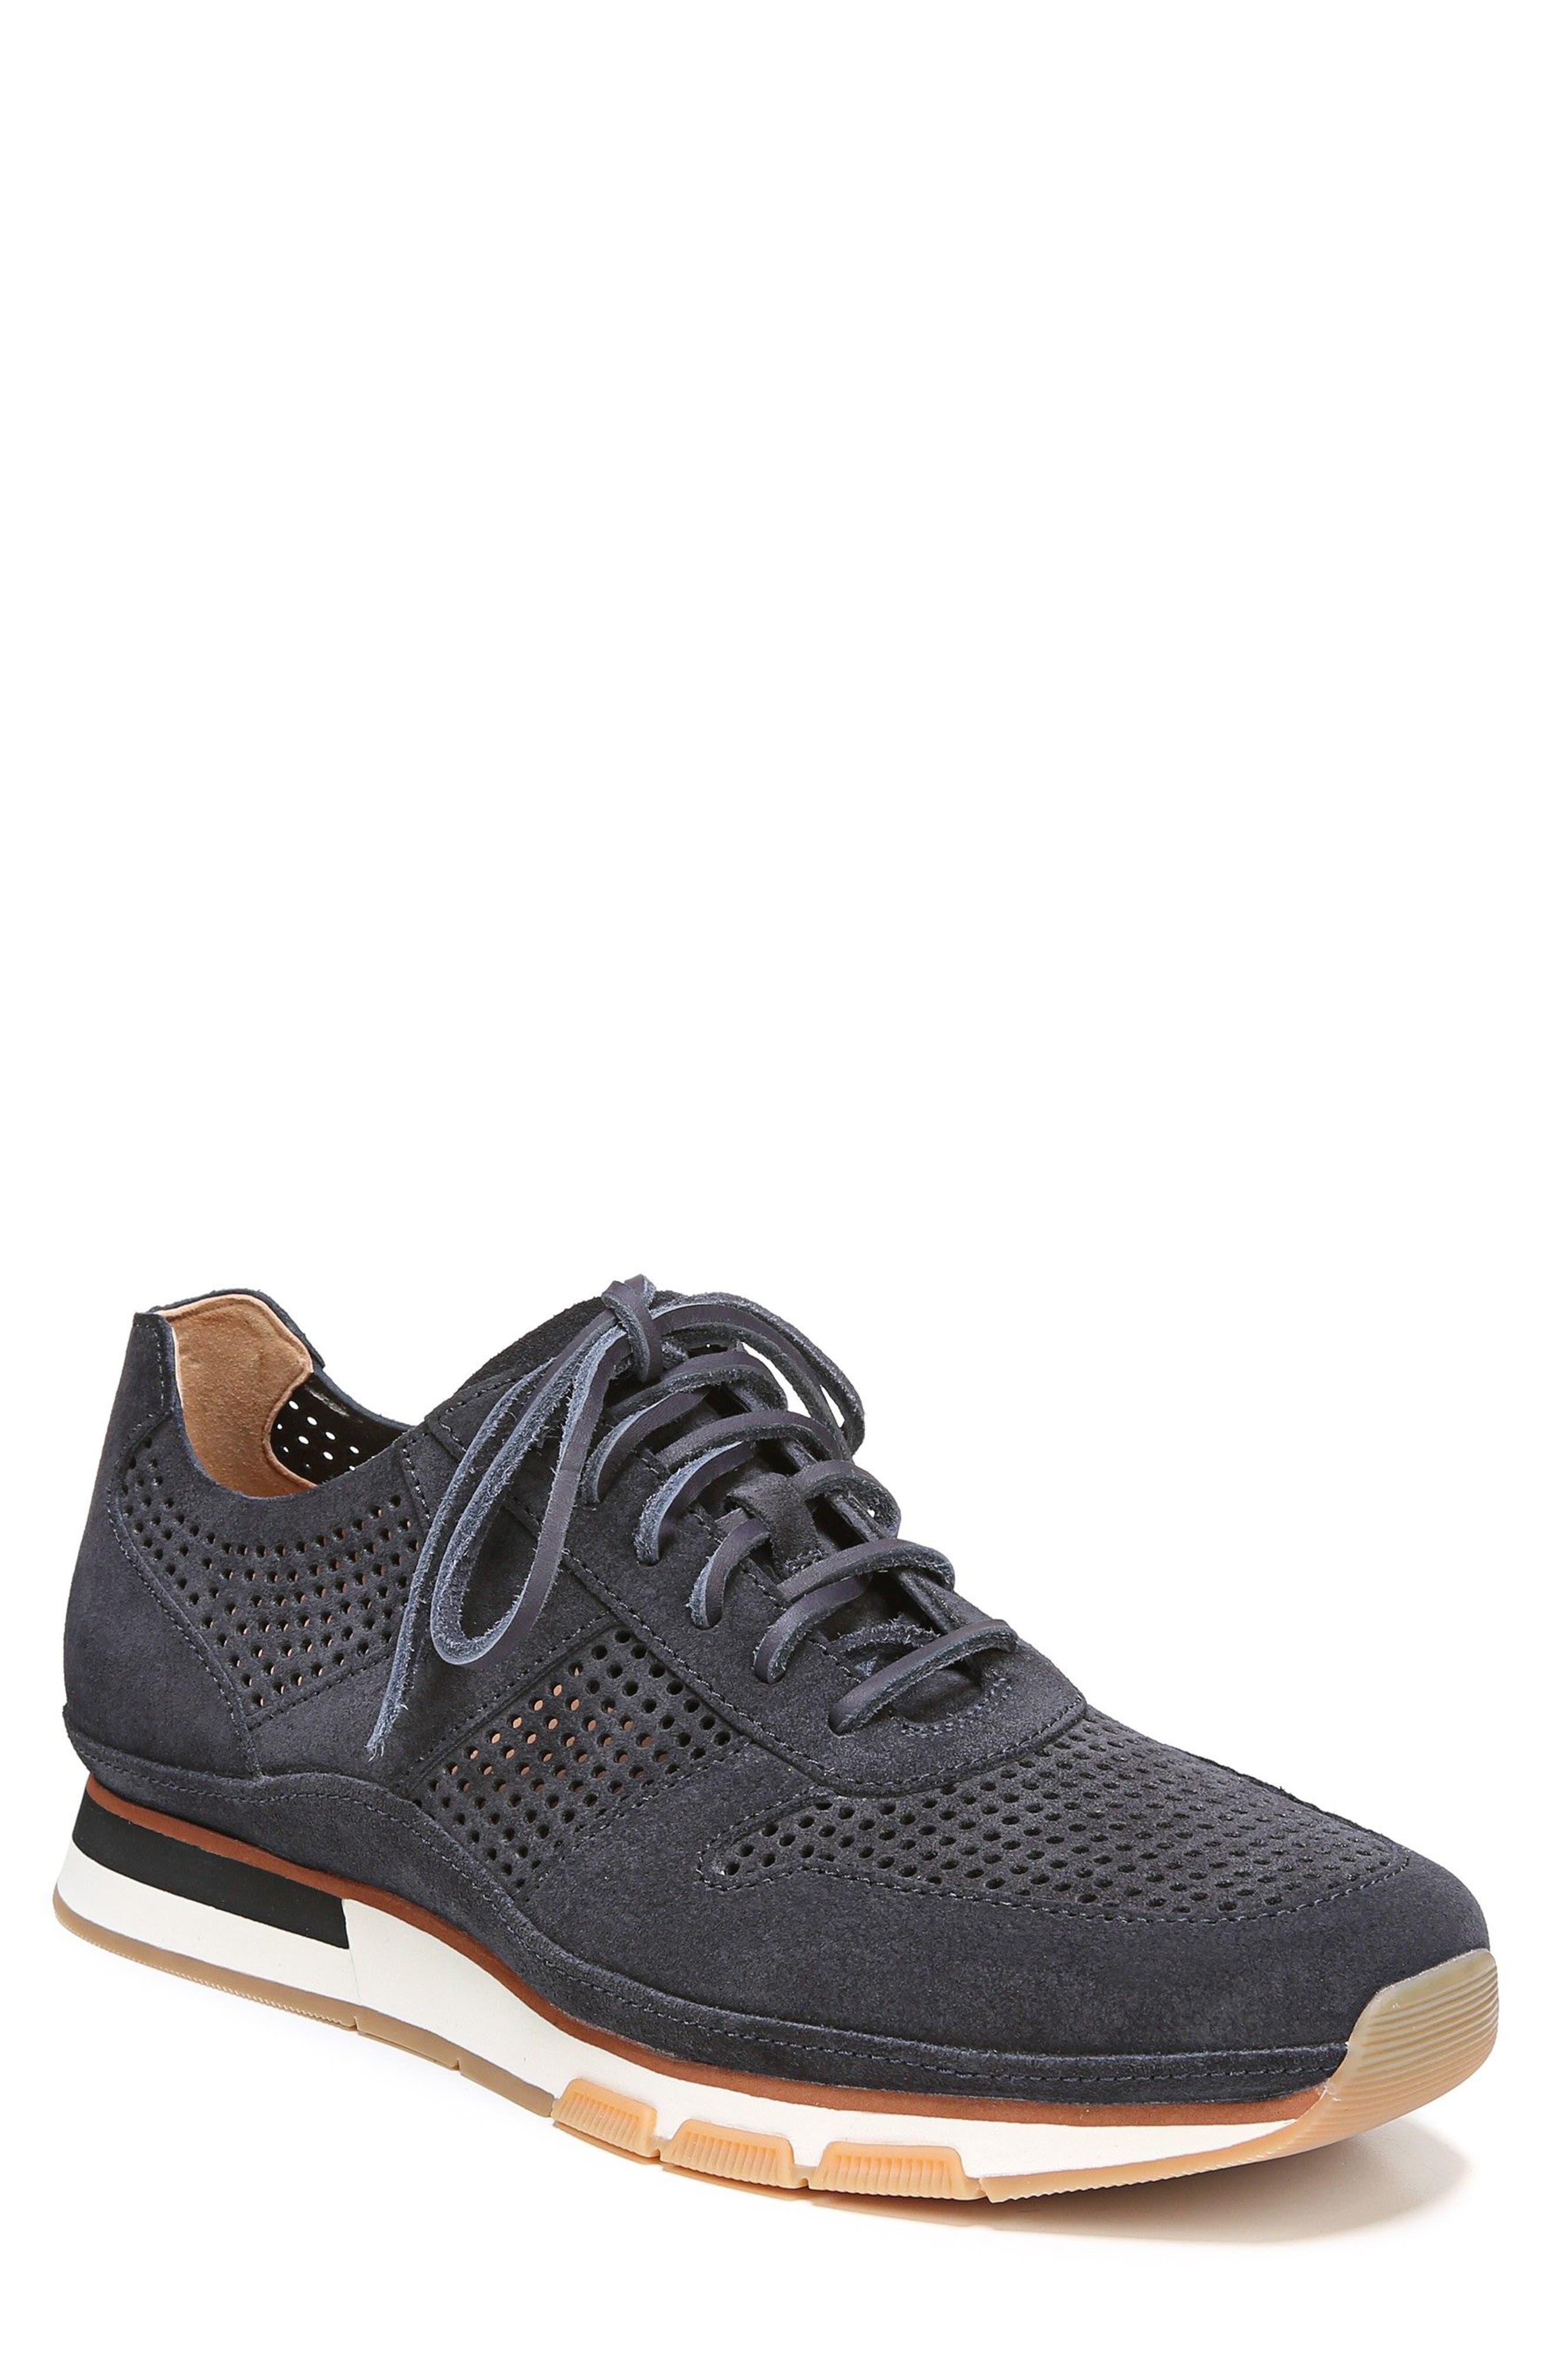 Larson Perforated Sneaker,                             Main thumbnail 1, color,                             Coastal